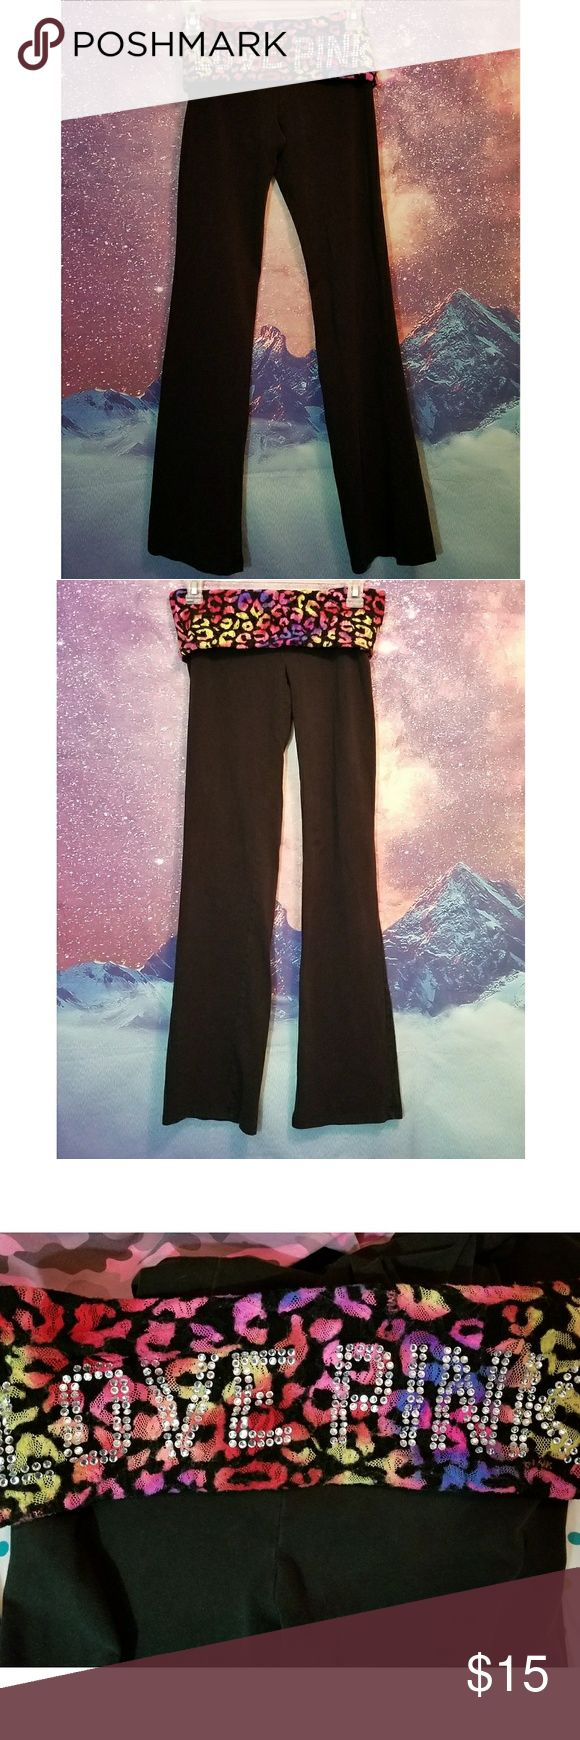 Victoria's Secret PINK Yoga Pants Size Small Great Condition PINK Victoria's Secret Pants Leggings #yogapants